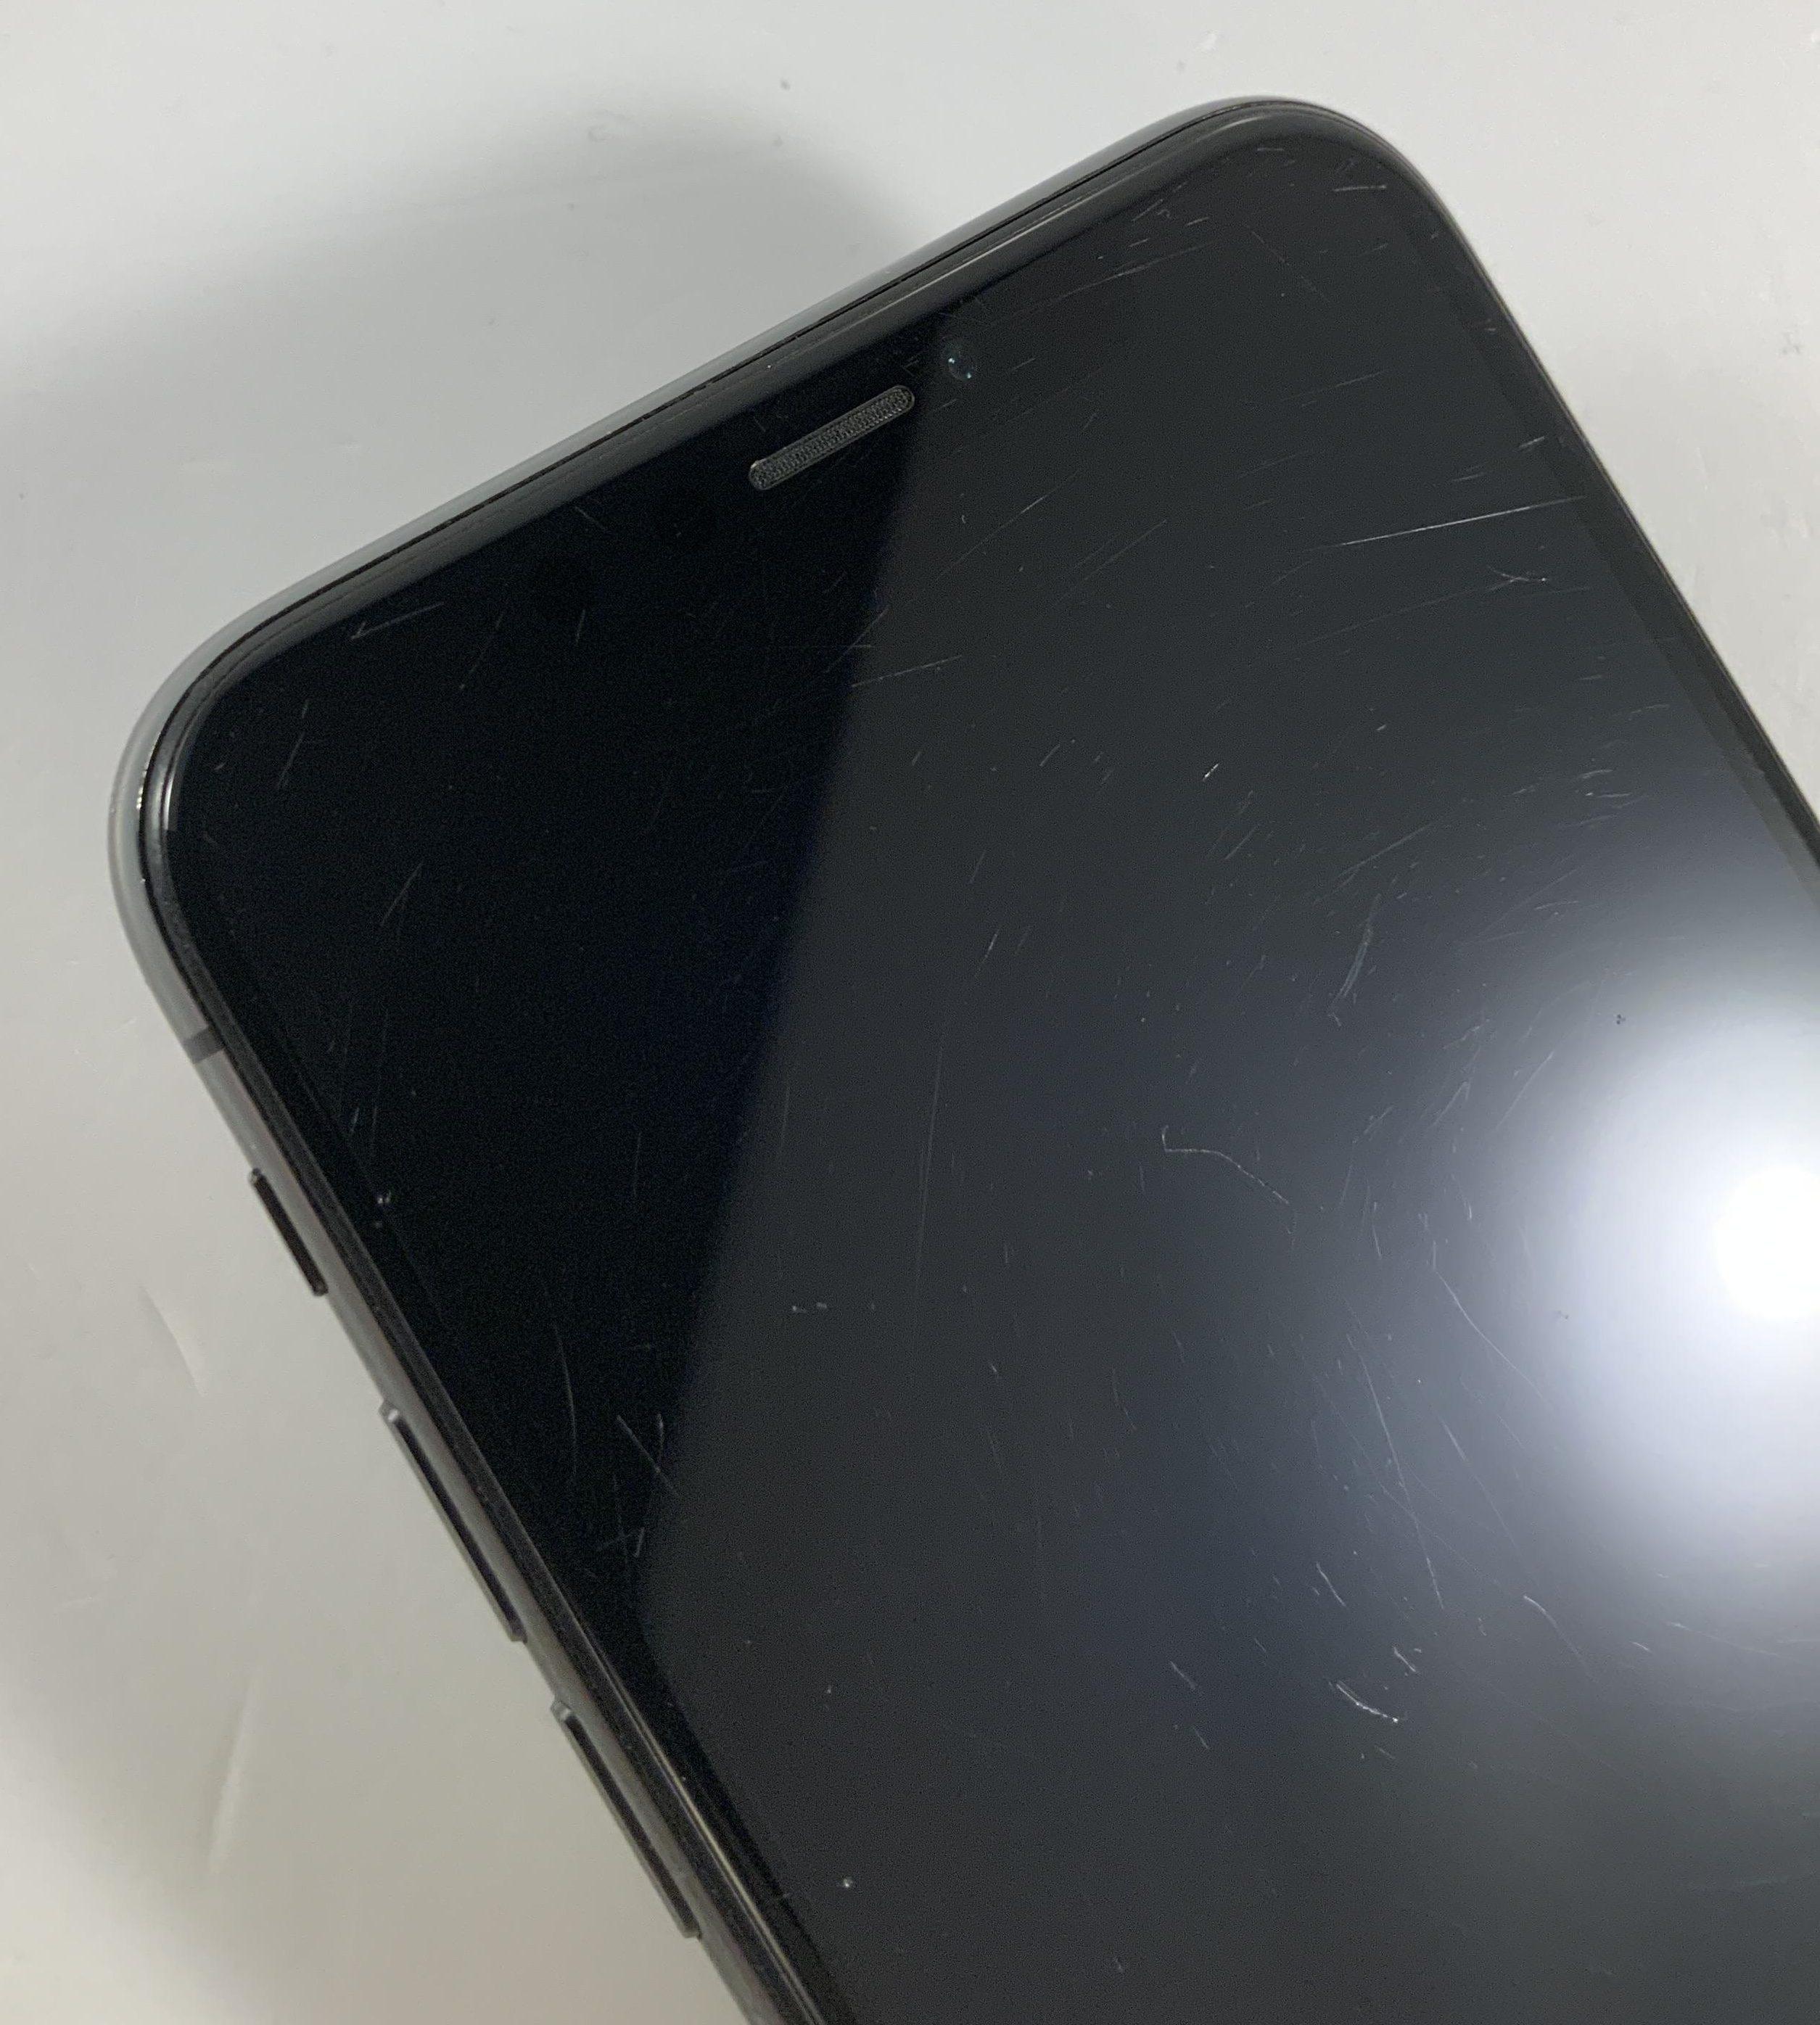 iPhone X 64GB, 64GB, Space Gray, bild 4